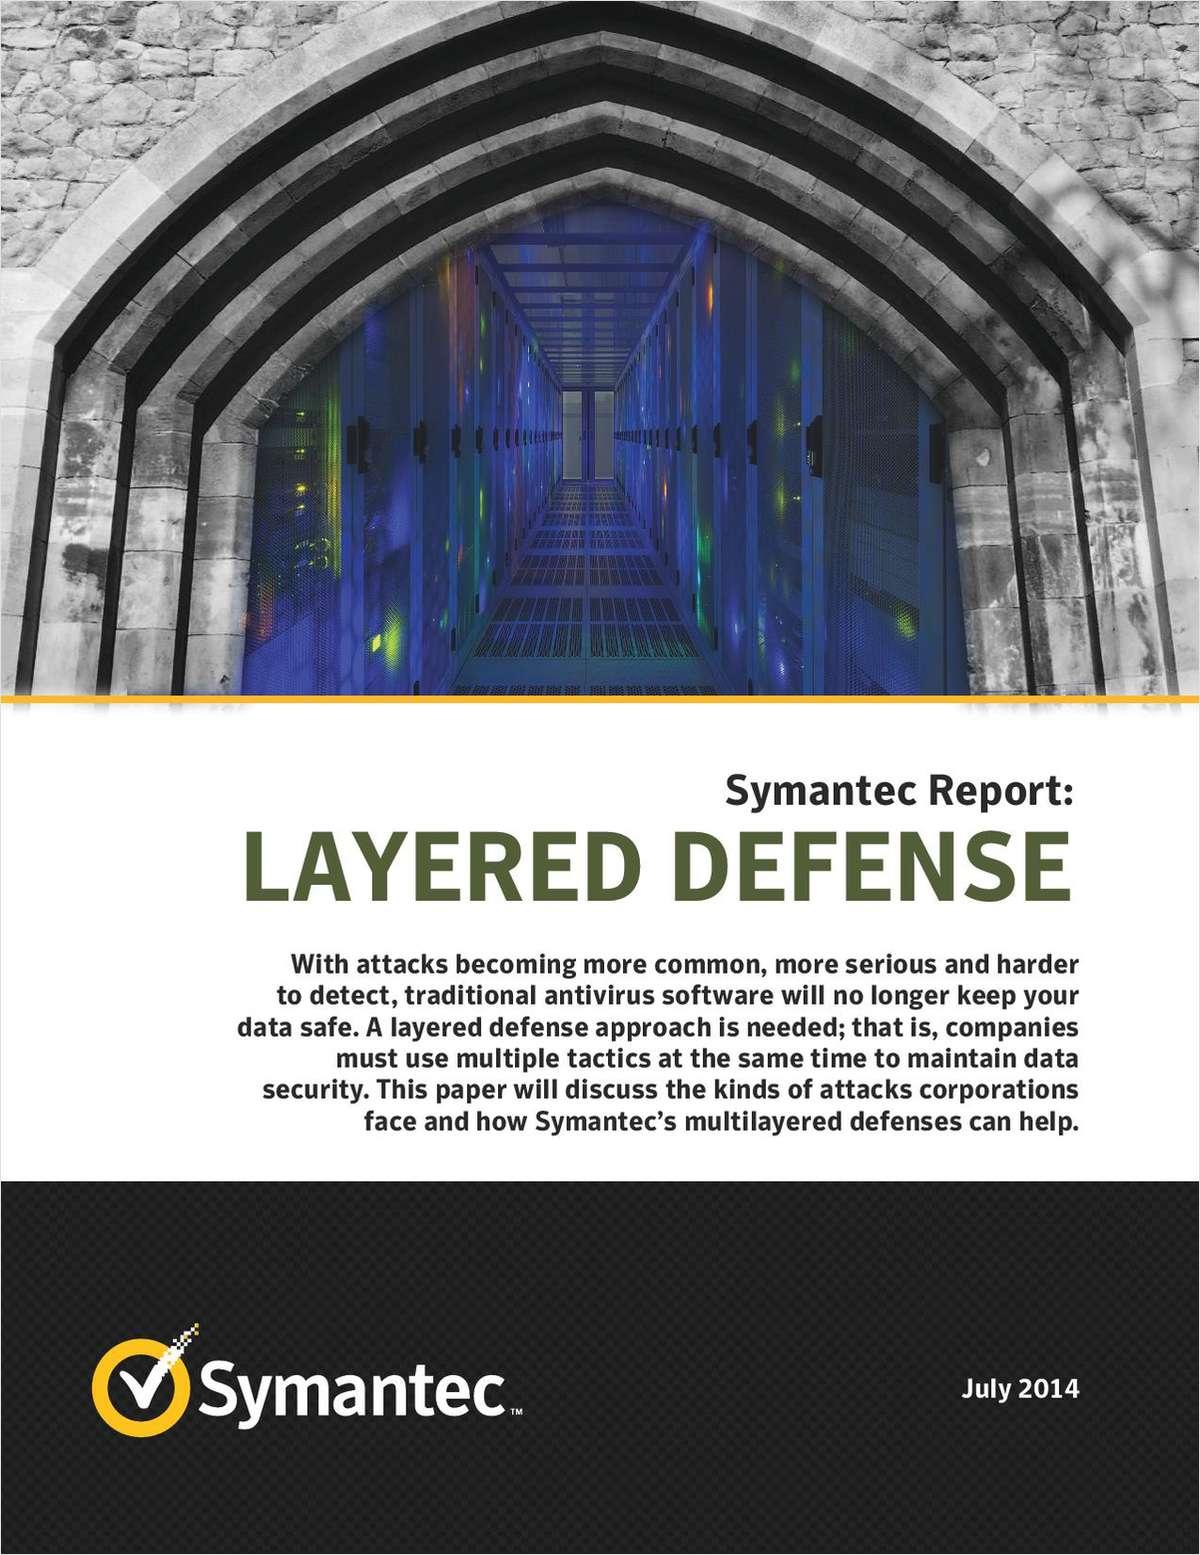 Symantec Report: Layered Defense